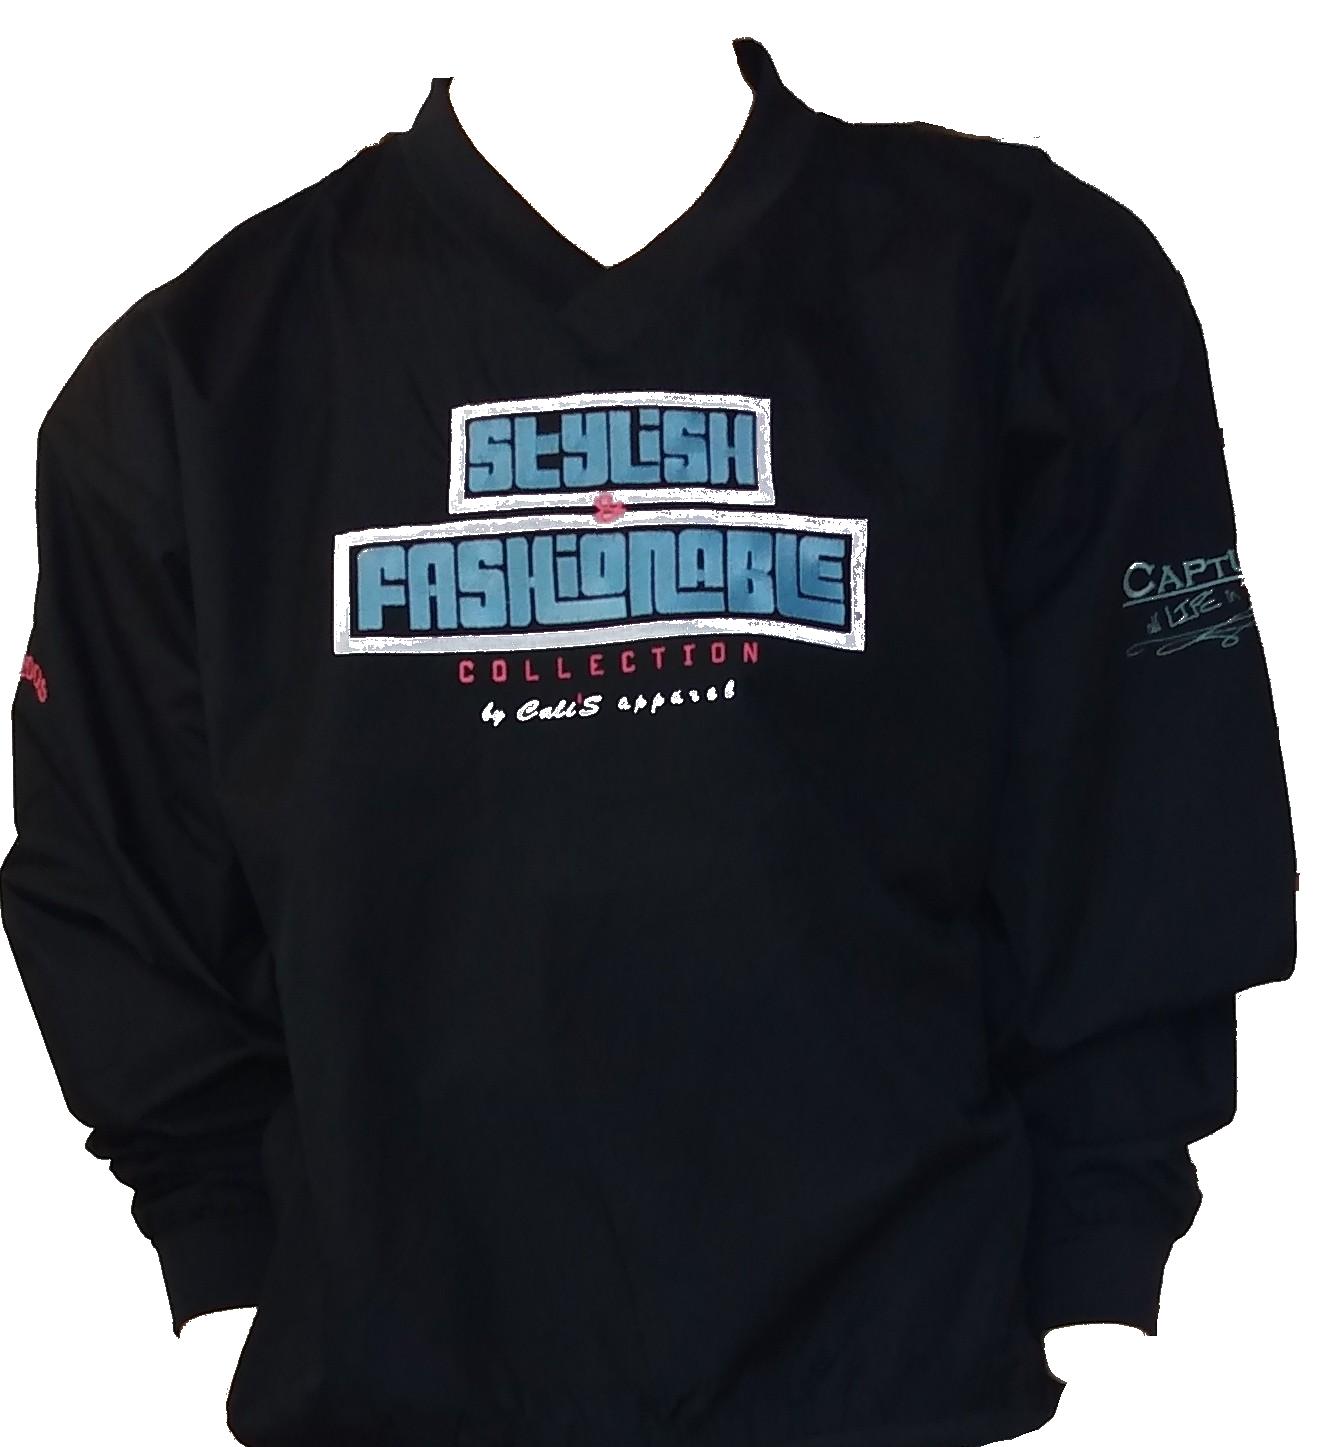 Cali's apparel Black S&F Unisex V Neck Pullover Windbreaker Jacket